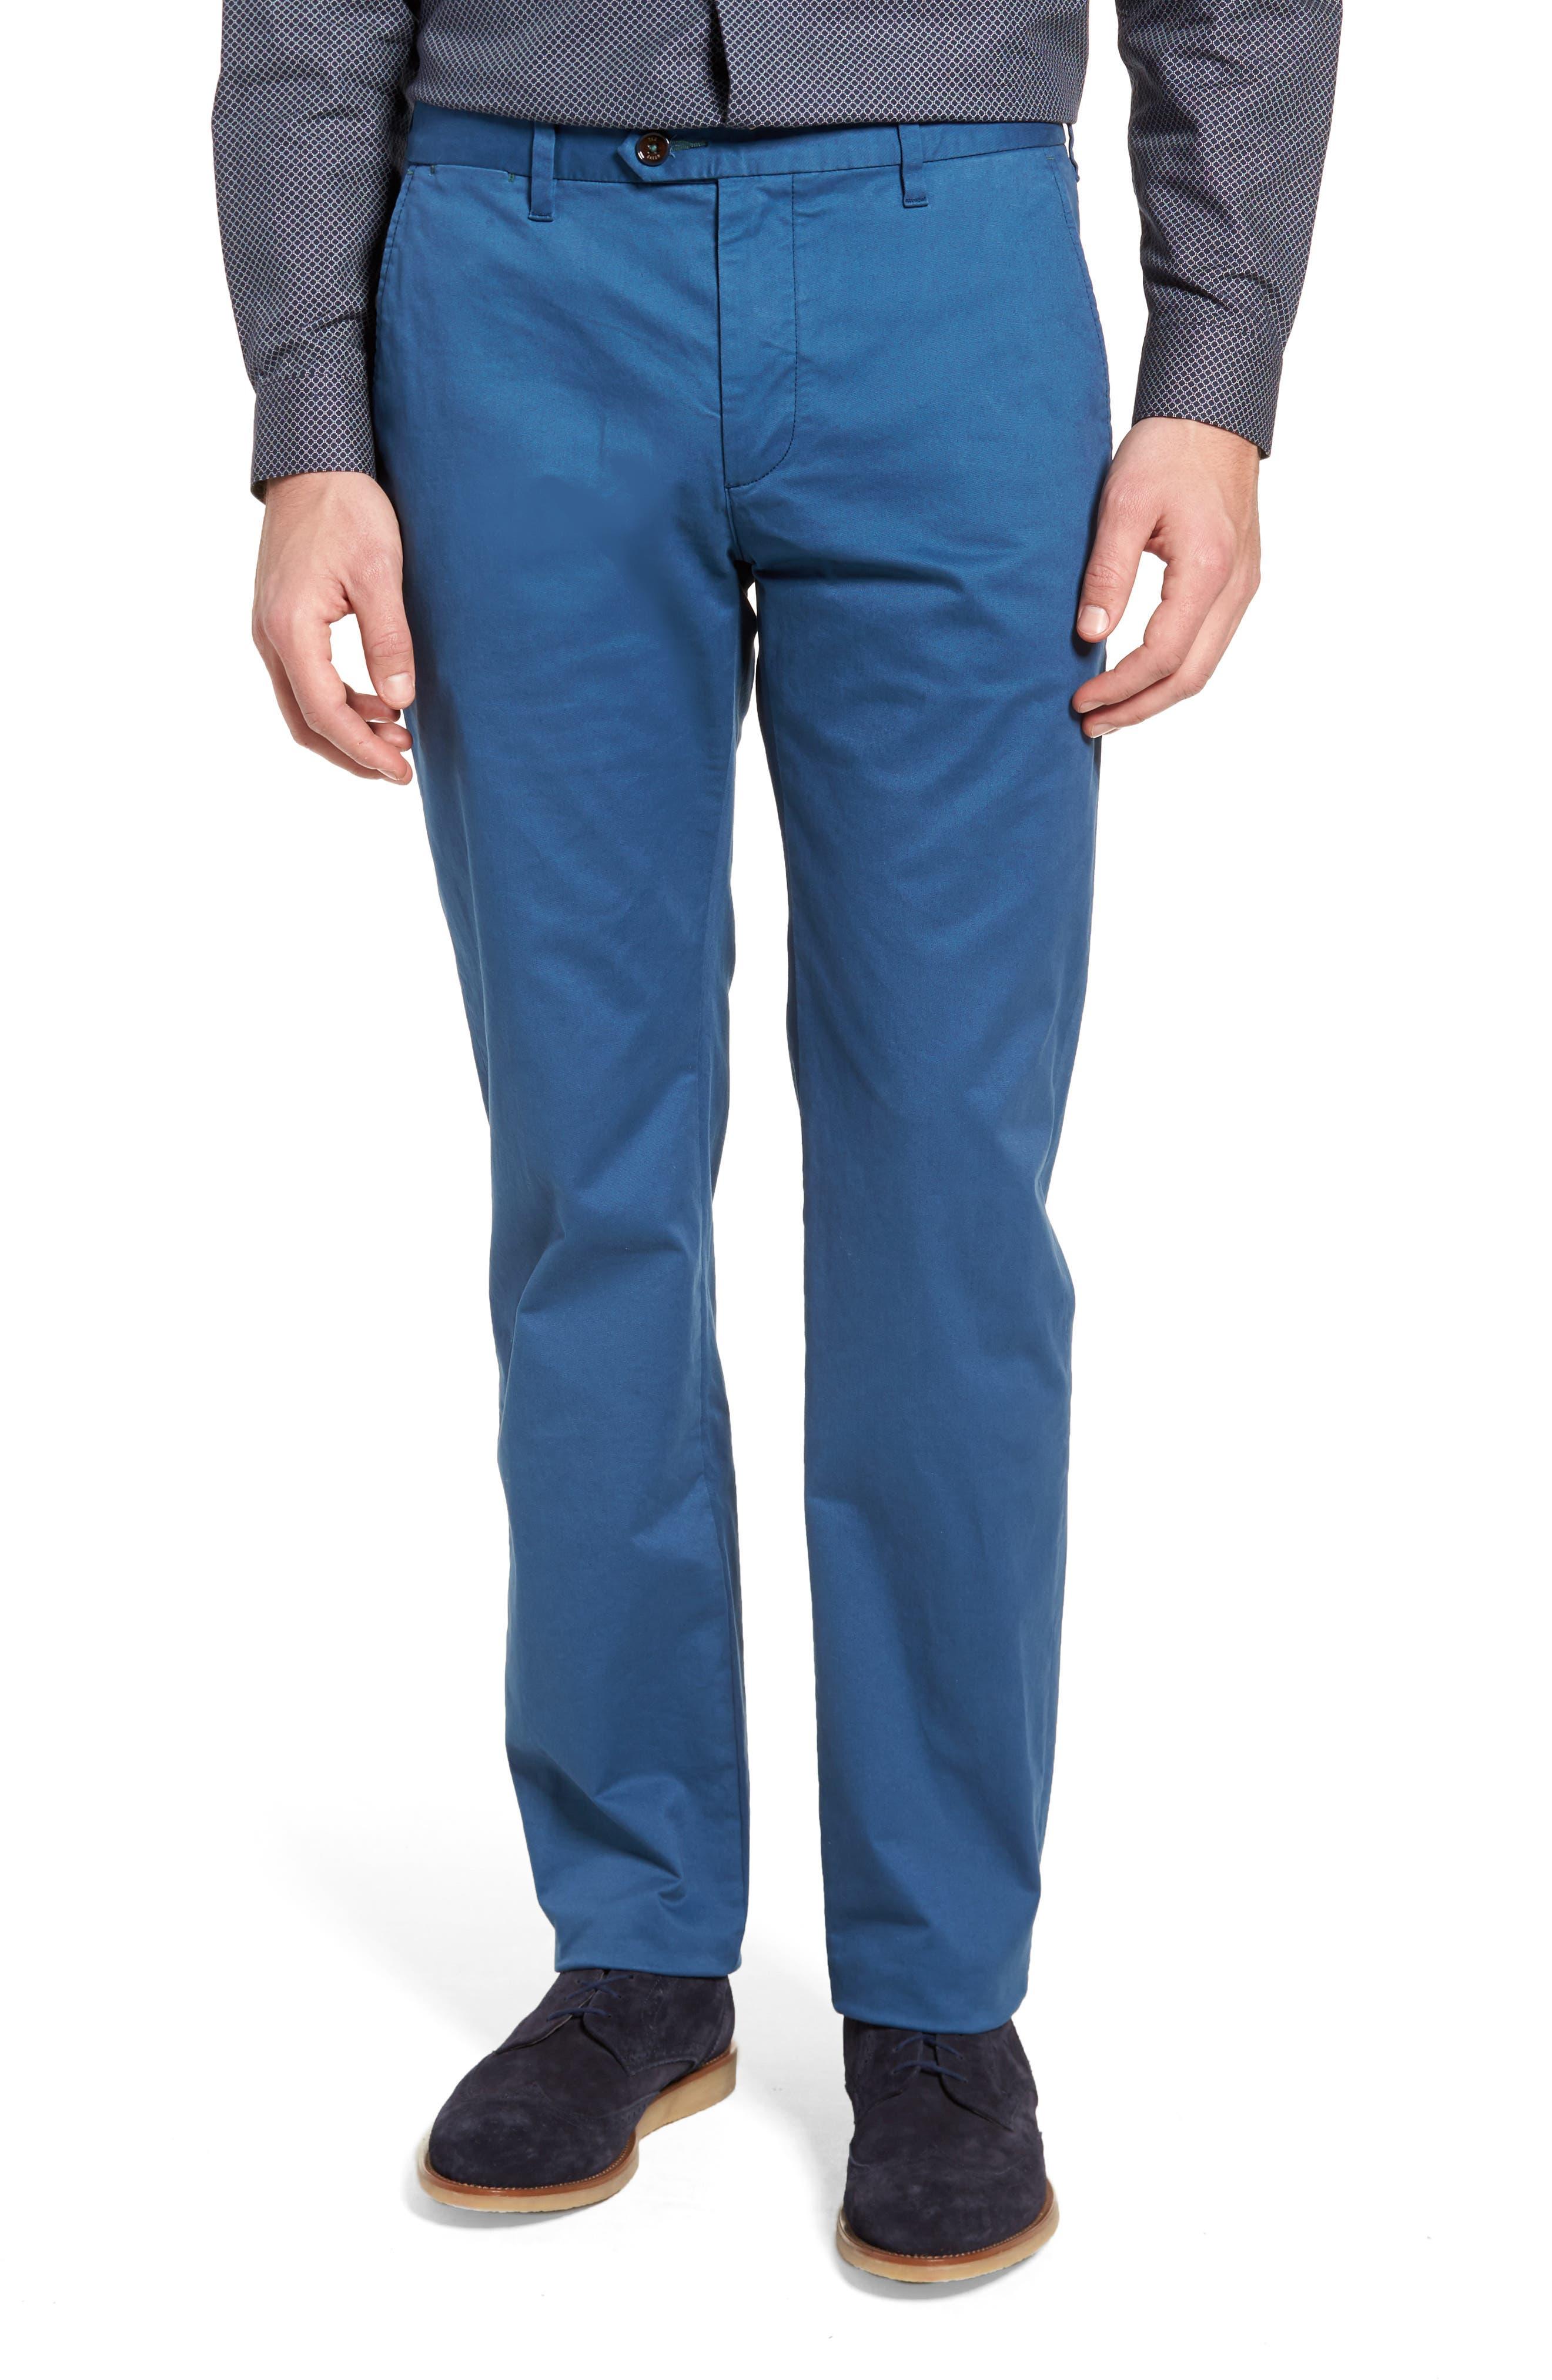 Procor Slim Fit Chino Pants,                         Main,                         color, Navy